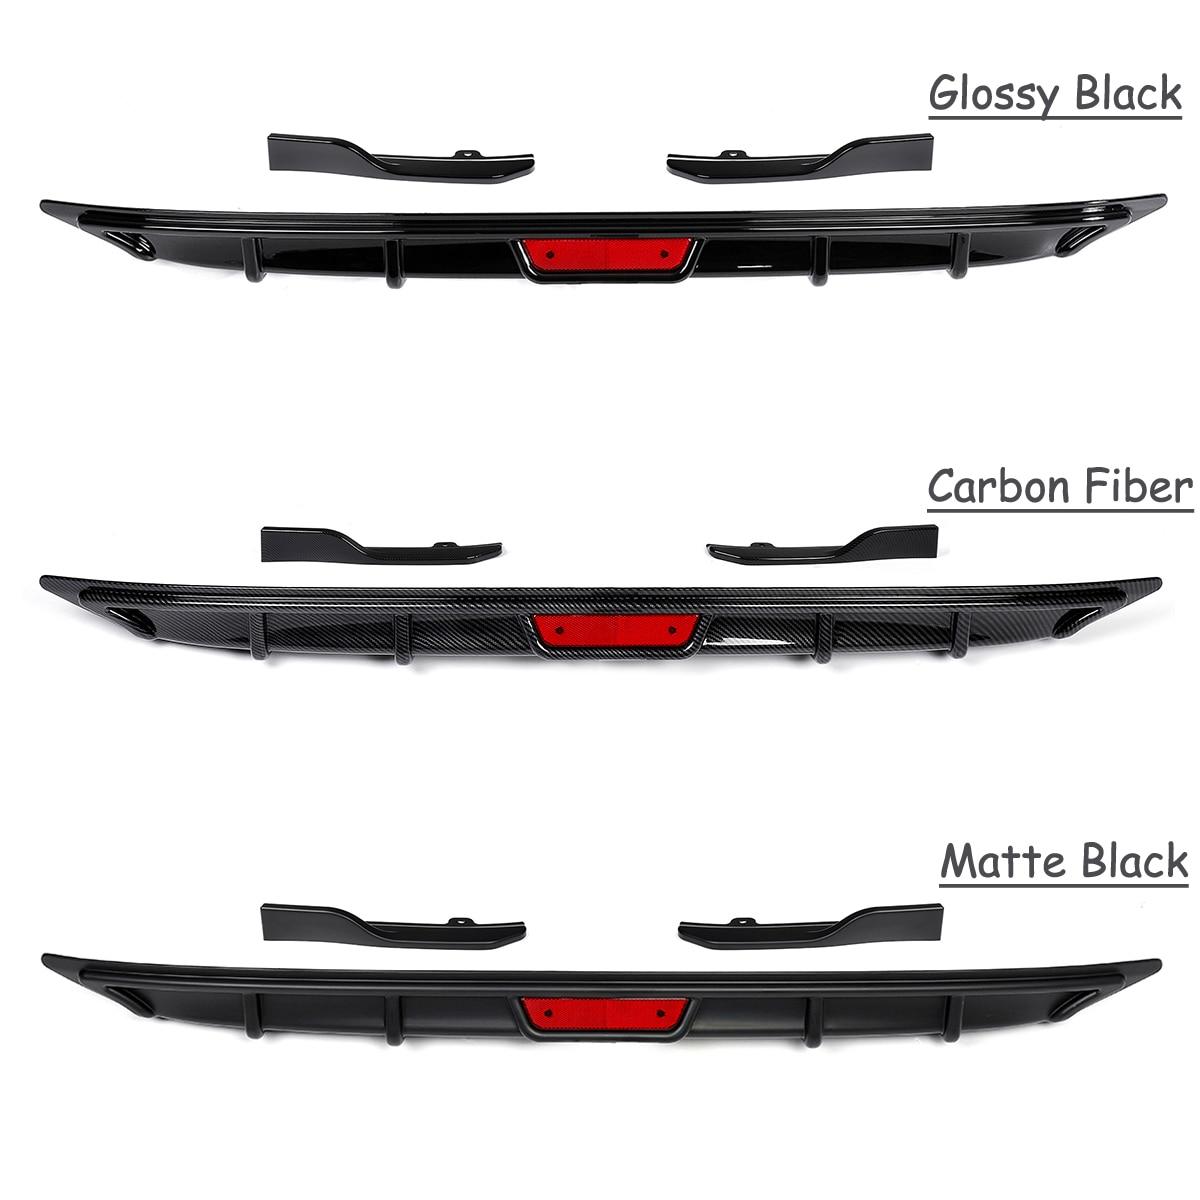 Fit For Honda For Accord 2018 Rear Bumper Chin Cover Lip Diffuser Side Spoiler Wing Matte Black/ Glossy Black/ Carbon Fiber